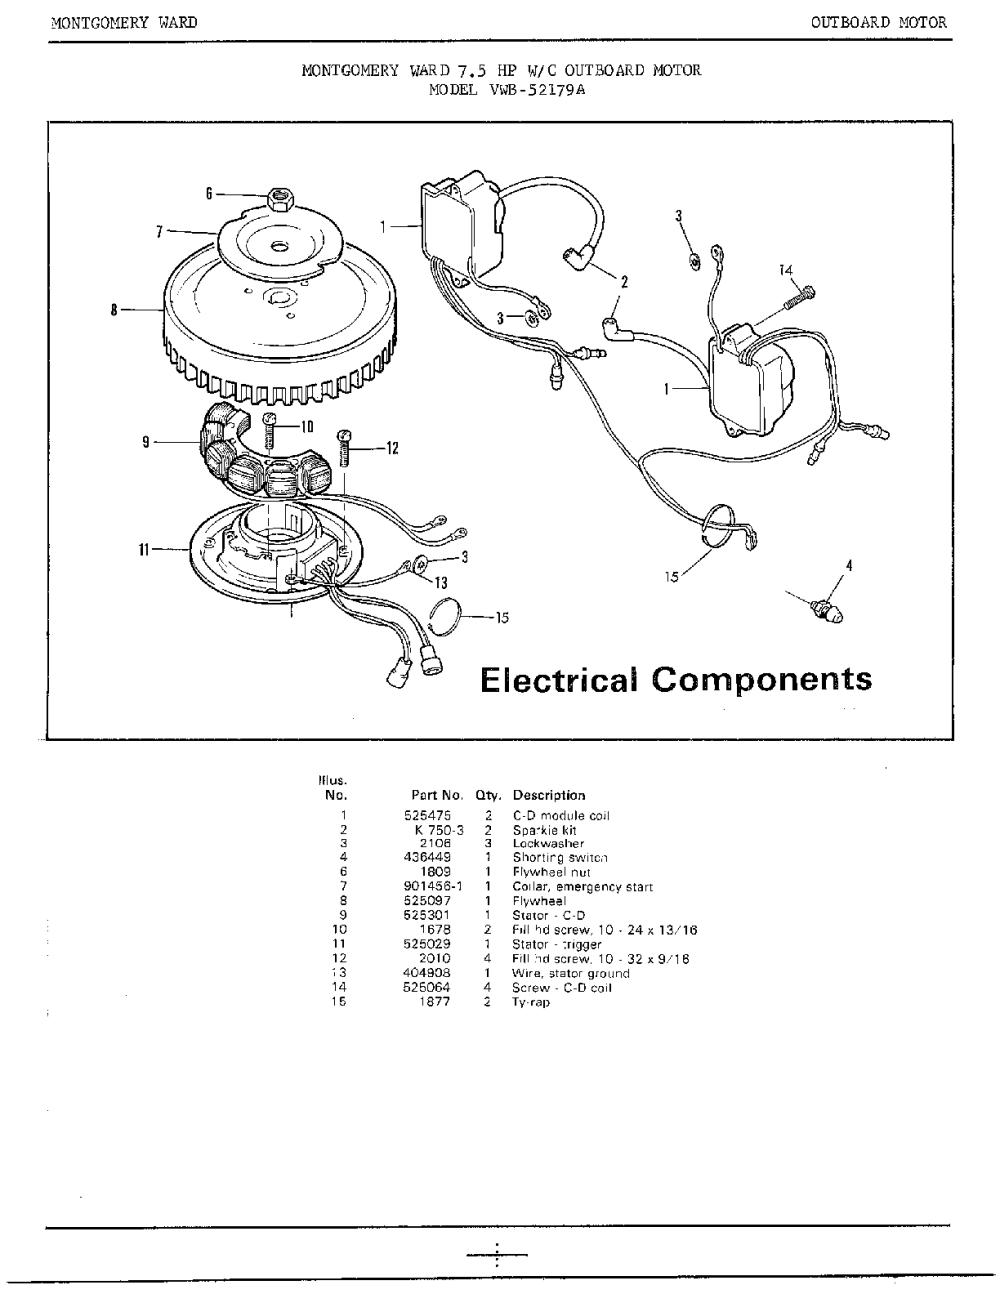 medium resolution of 7 5 mercury outboard schematic